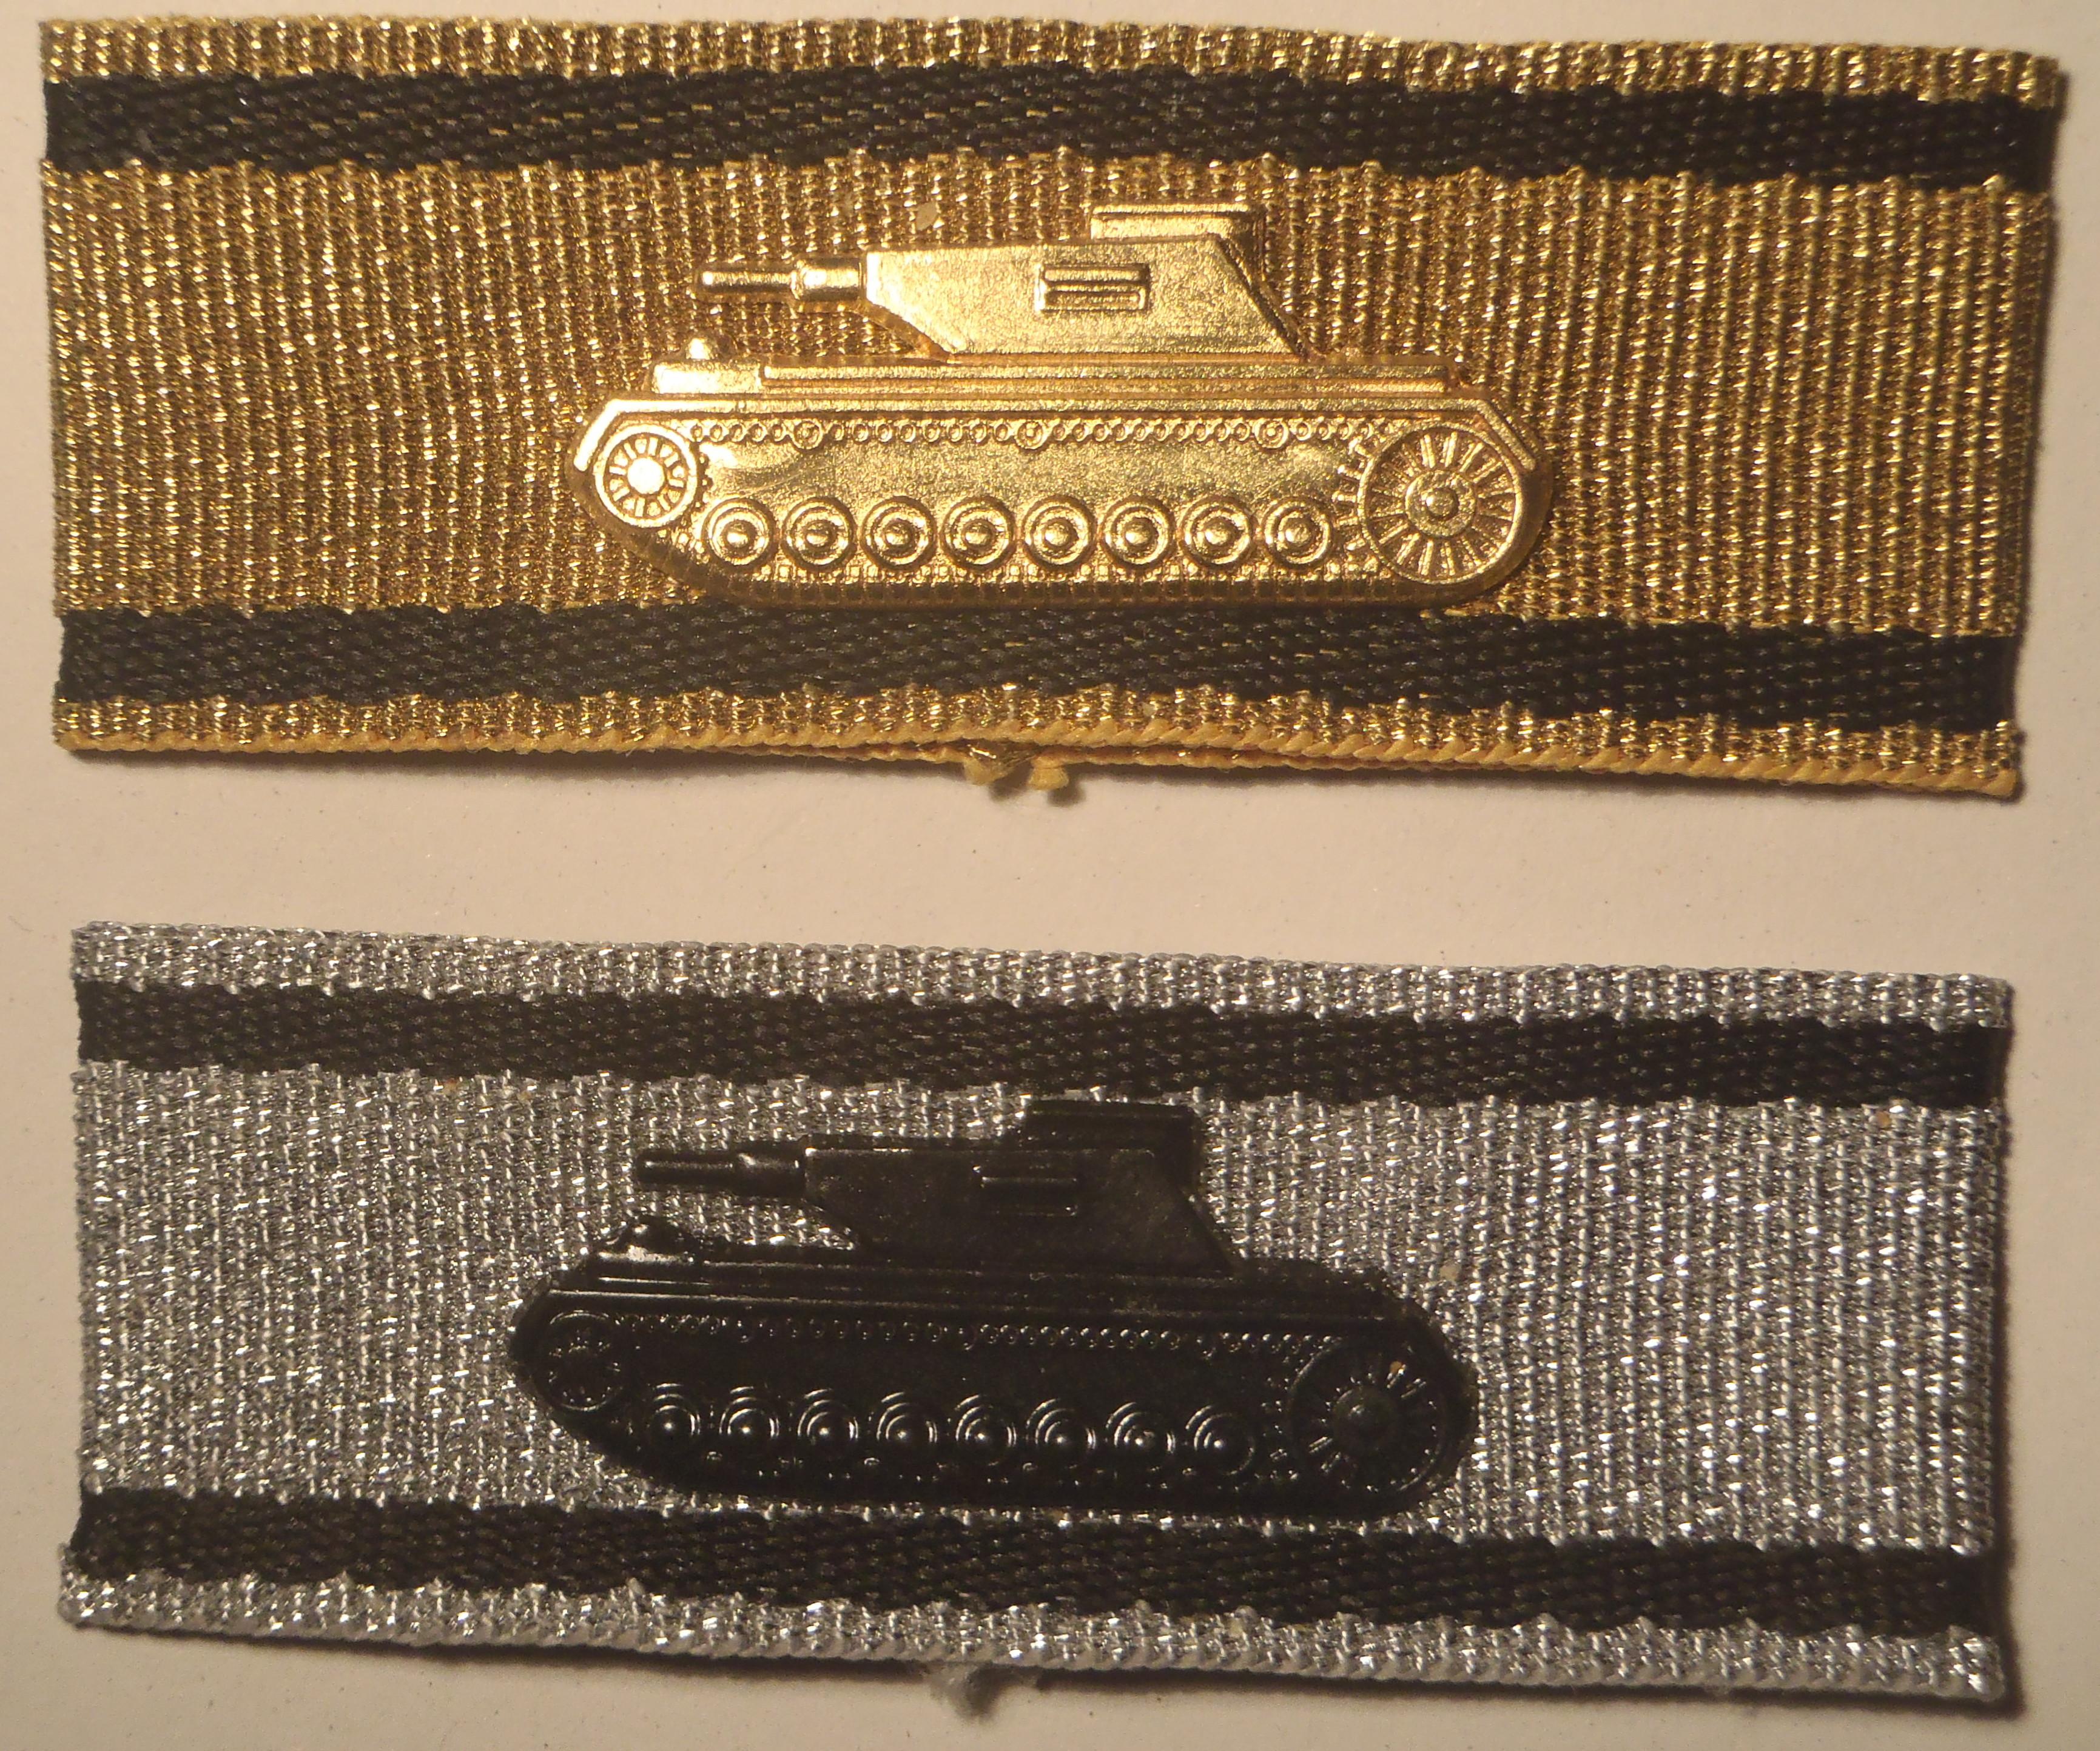 Tank Destruction Badge - Wikipedia